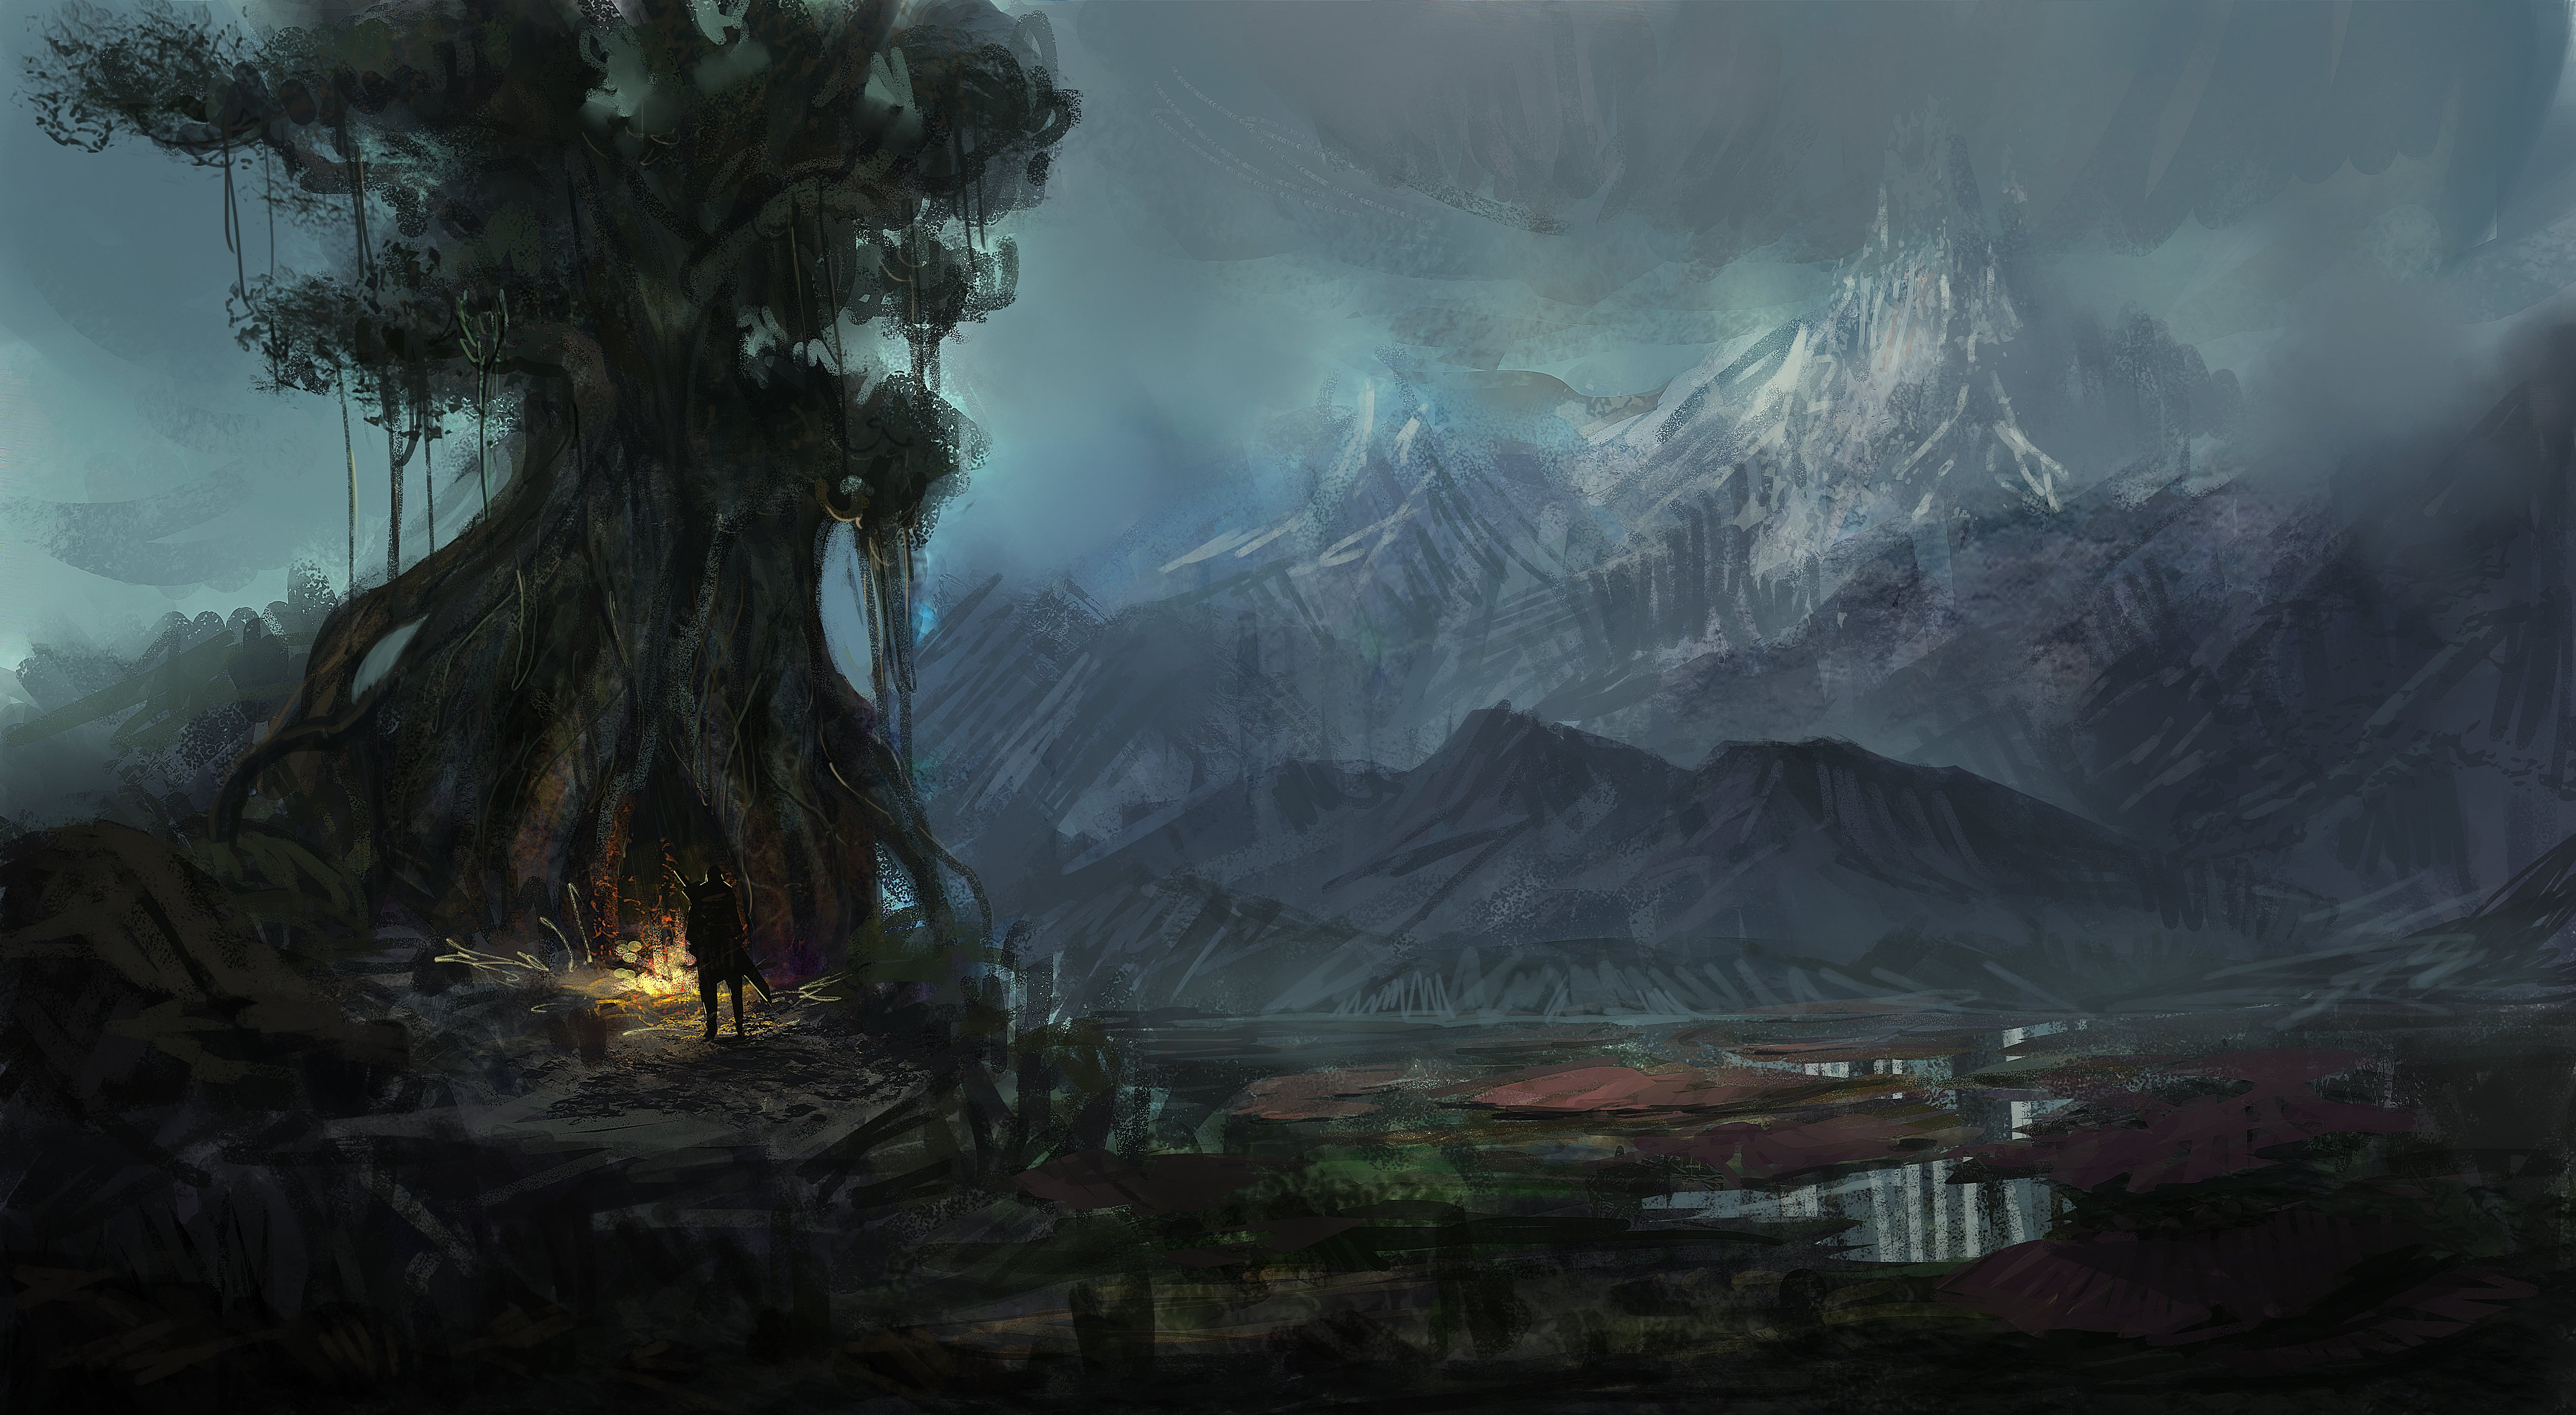 fantasy landscape art artwork nature wallpaper 4641x2550